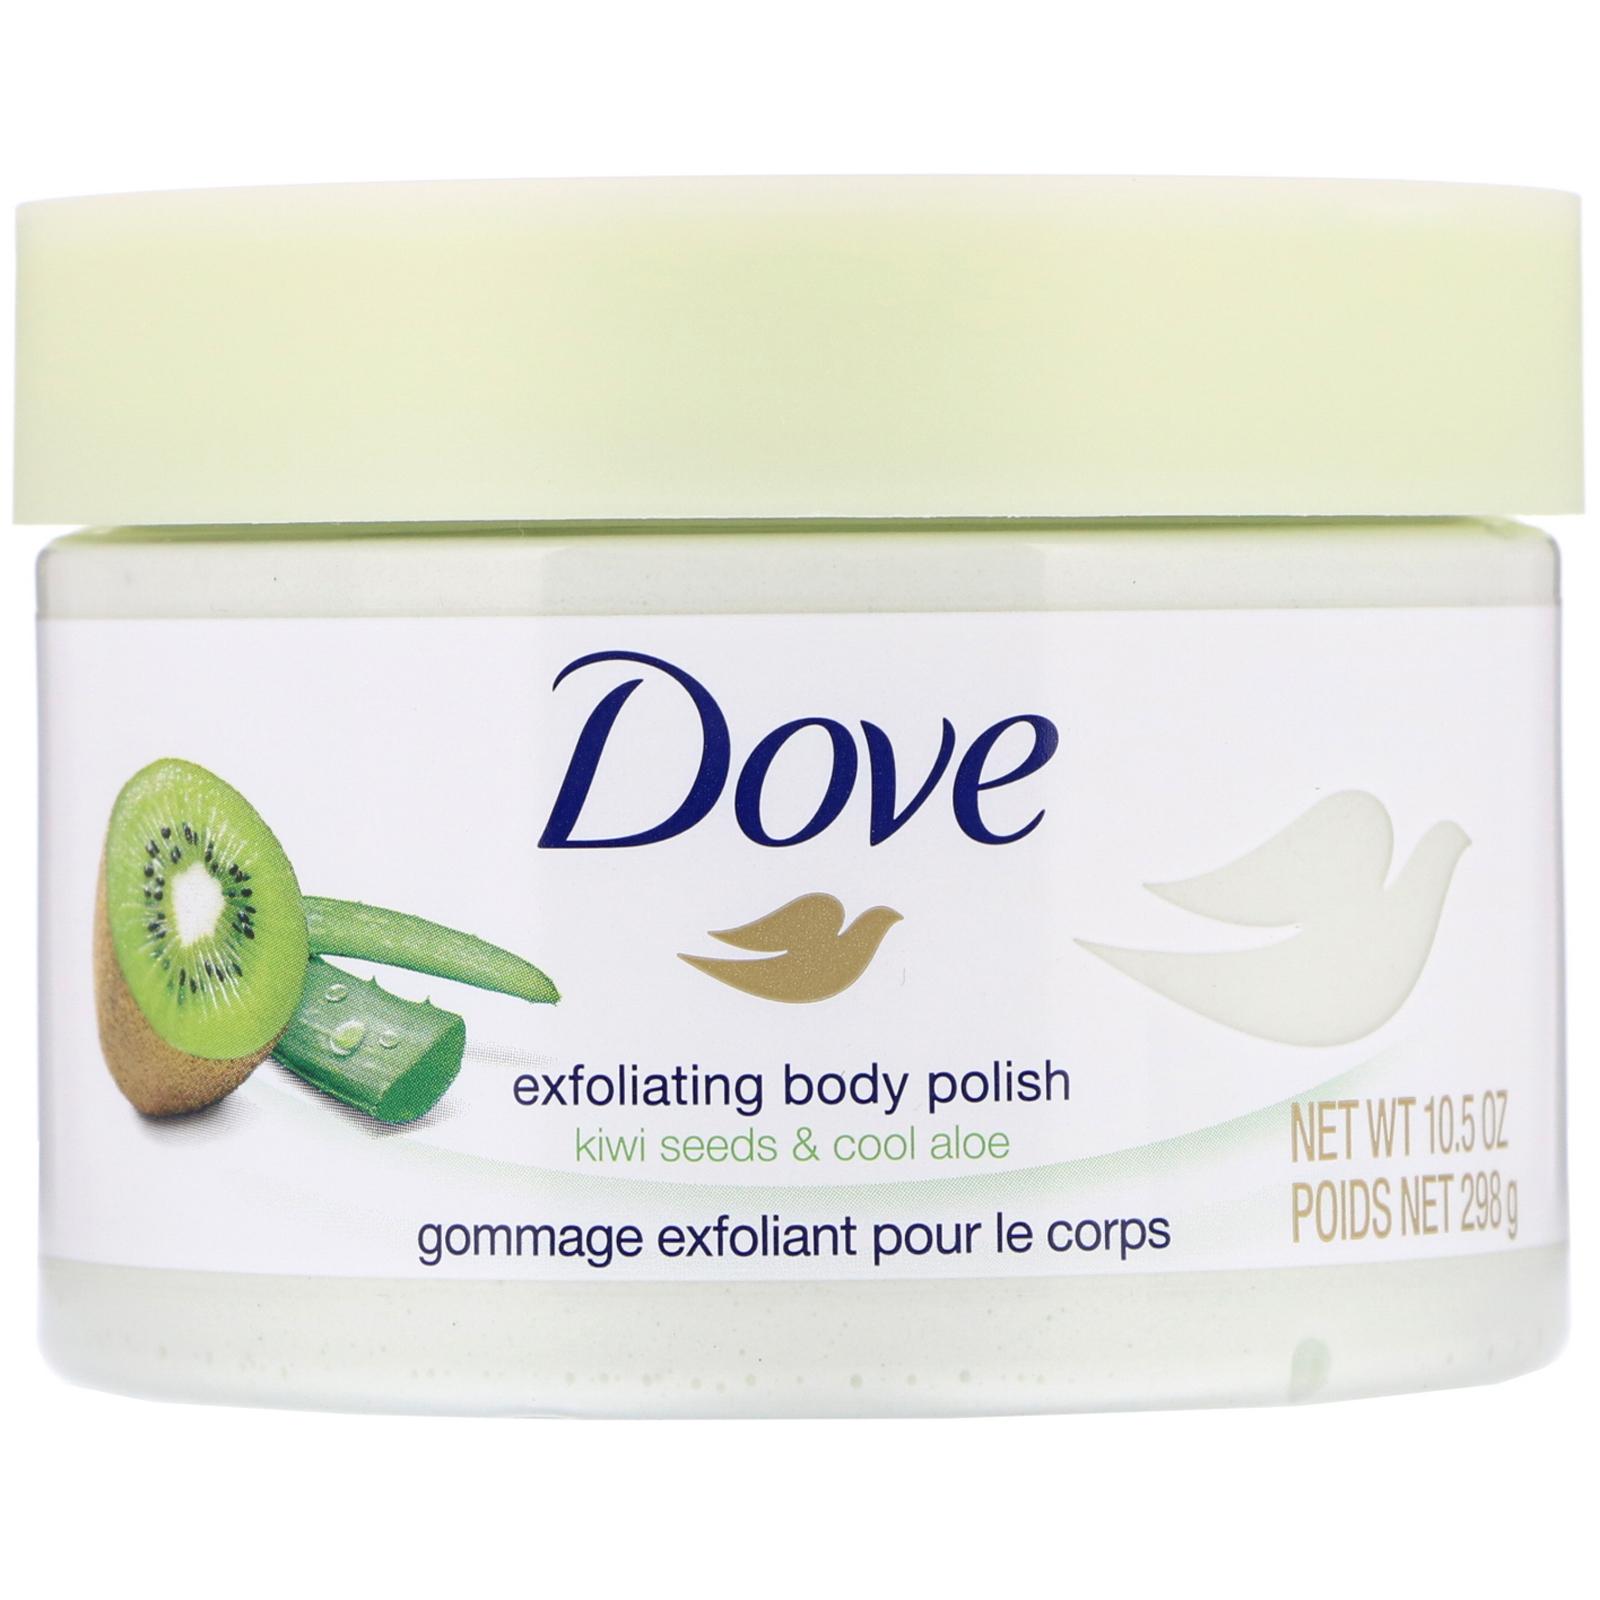 Dove Exfoliating Body Polish Kiwi Seeds Cool Aloe 10 5 Oz 298 G Iherb